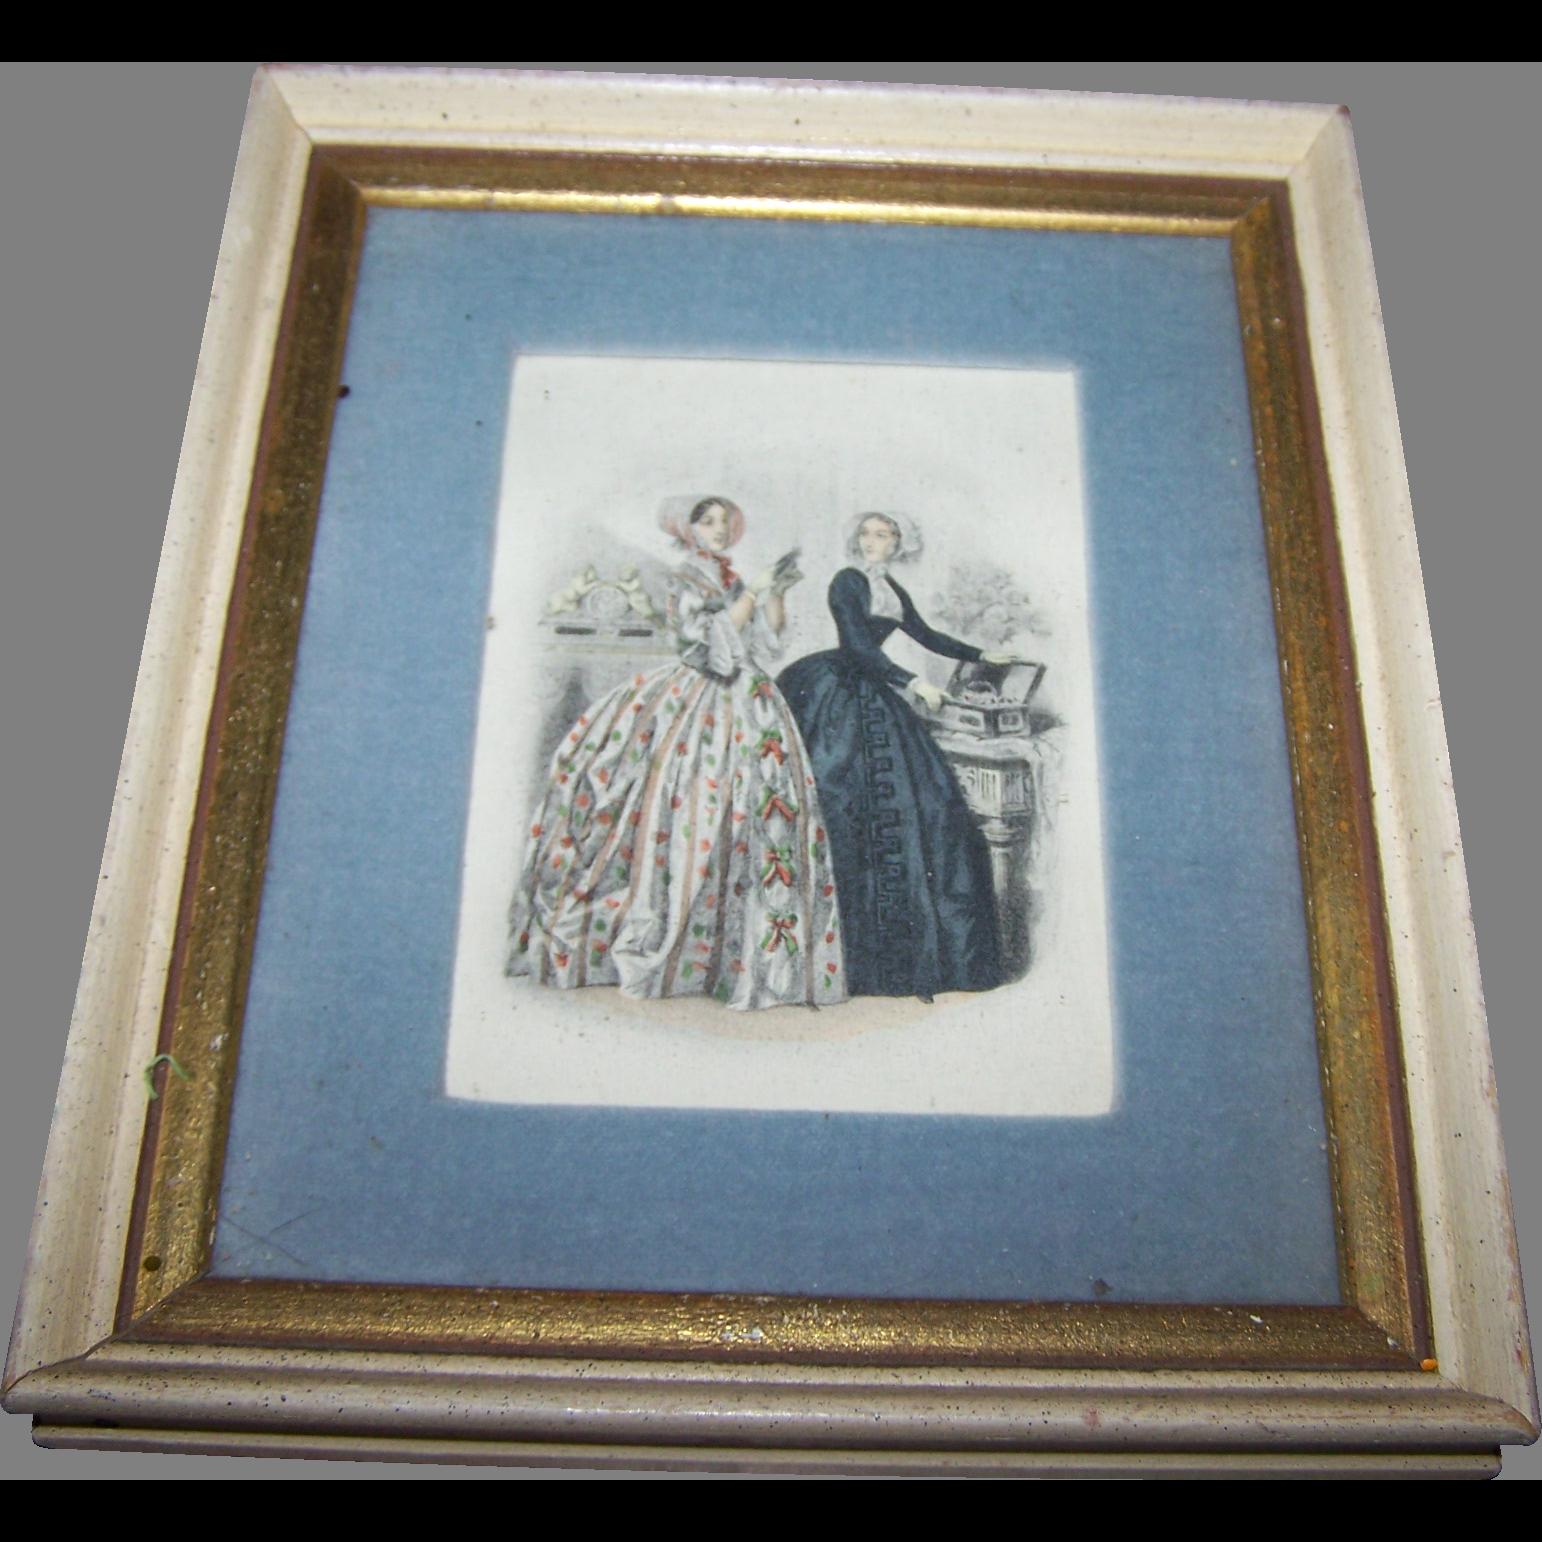 Vintage Collectible Ladies Of Fashion Print Fleck Bros. New York